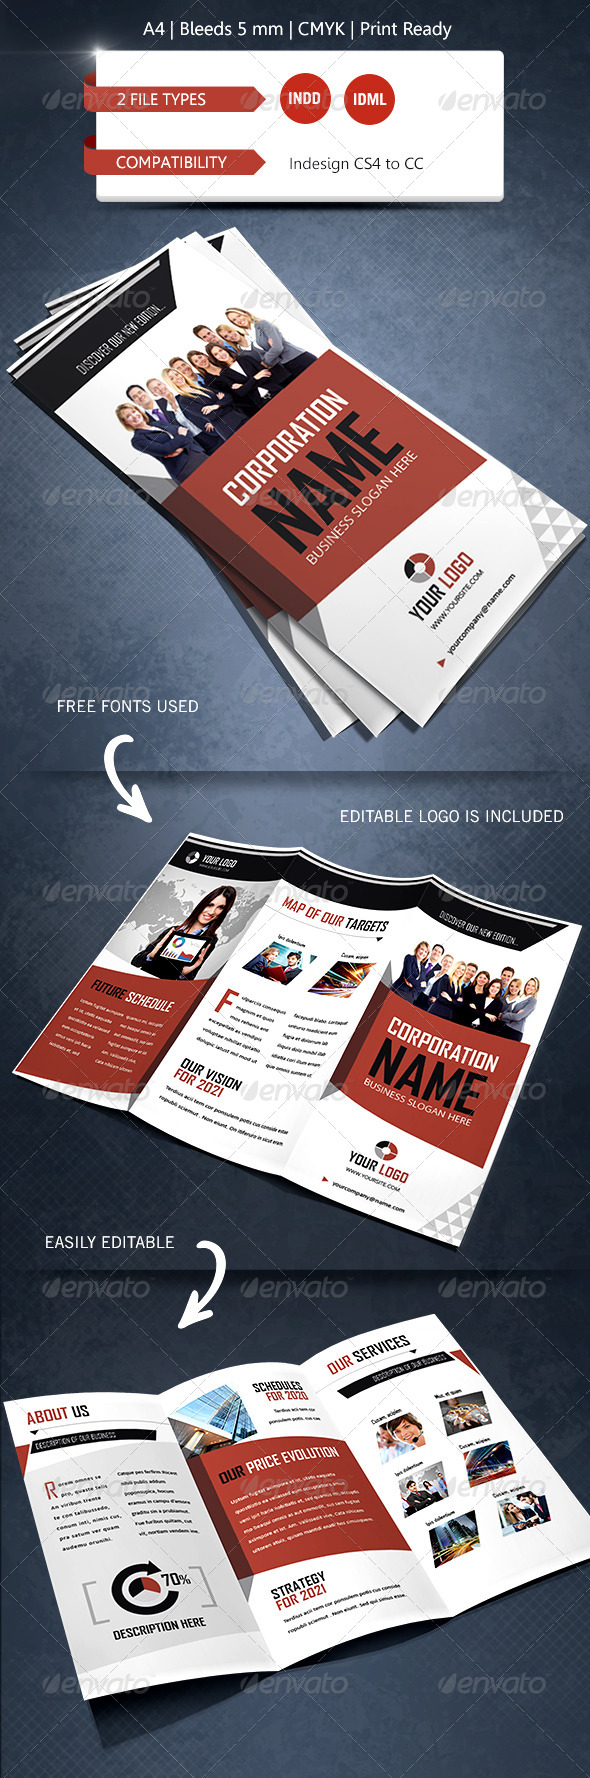 GraphicRiver Creative & Corporate Trifold Brochure Template 7867546